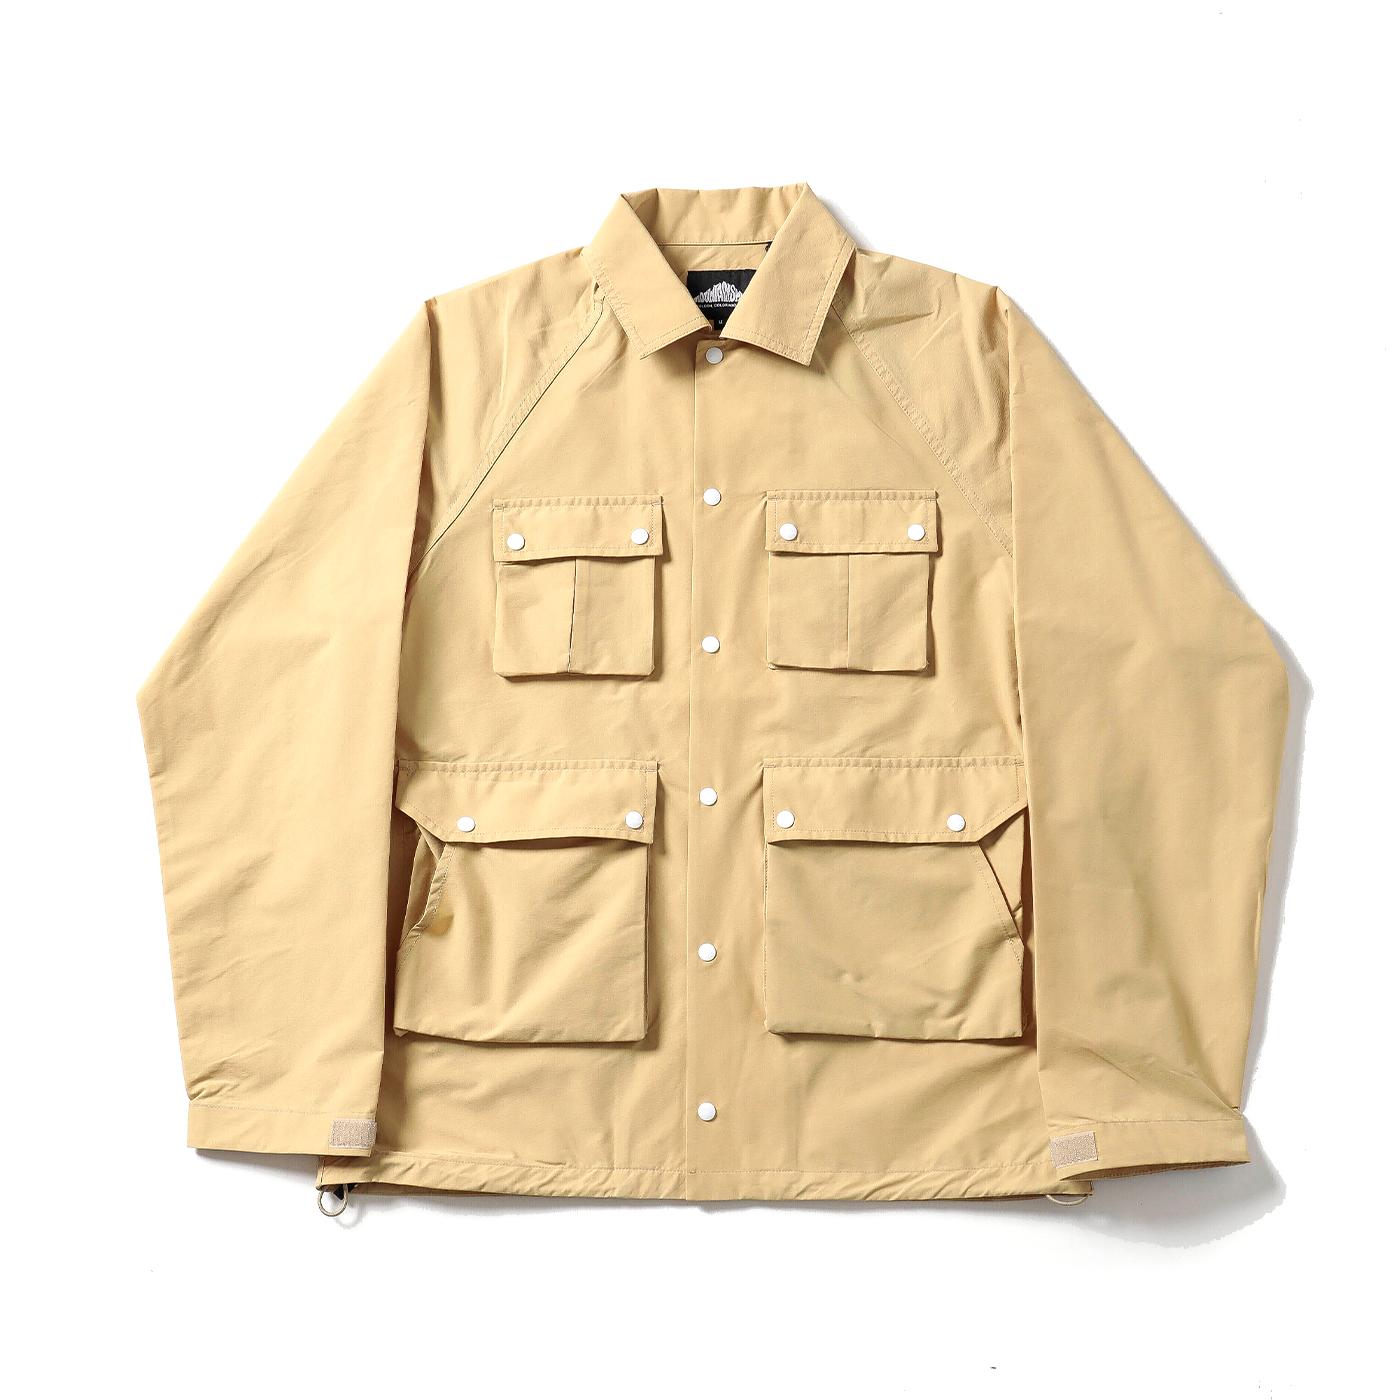 product: Delta Jacket / color: BEIGE 1